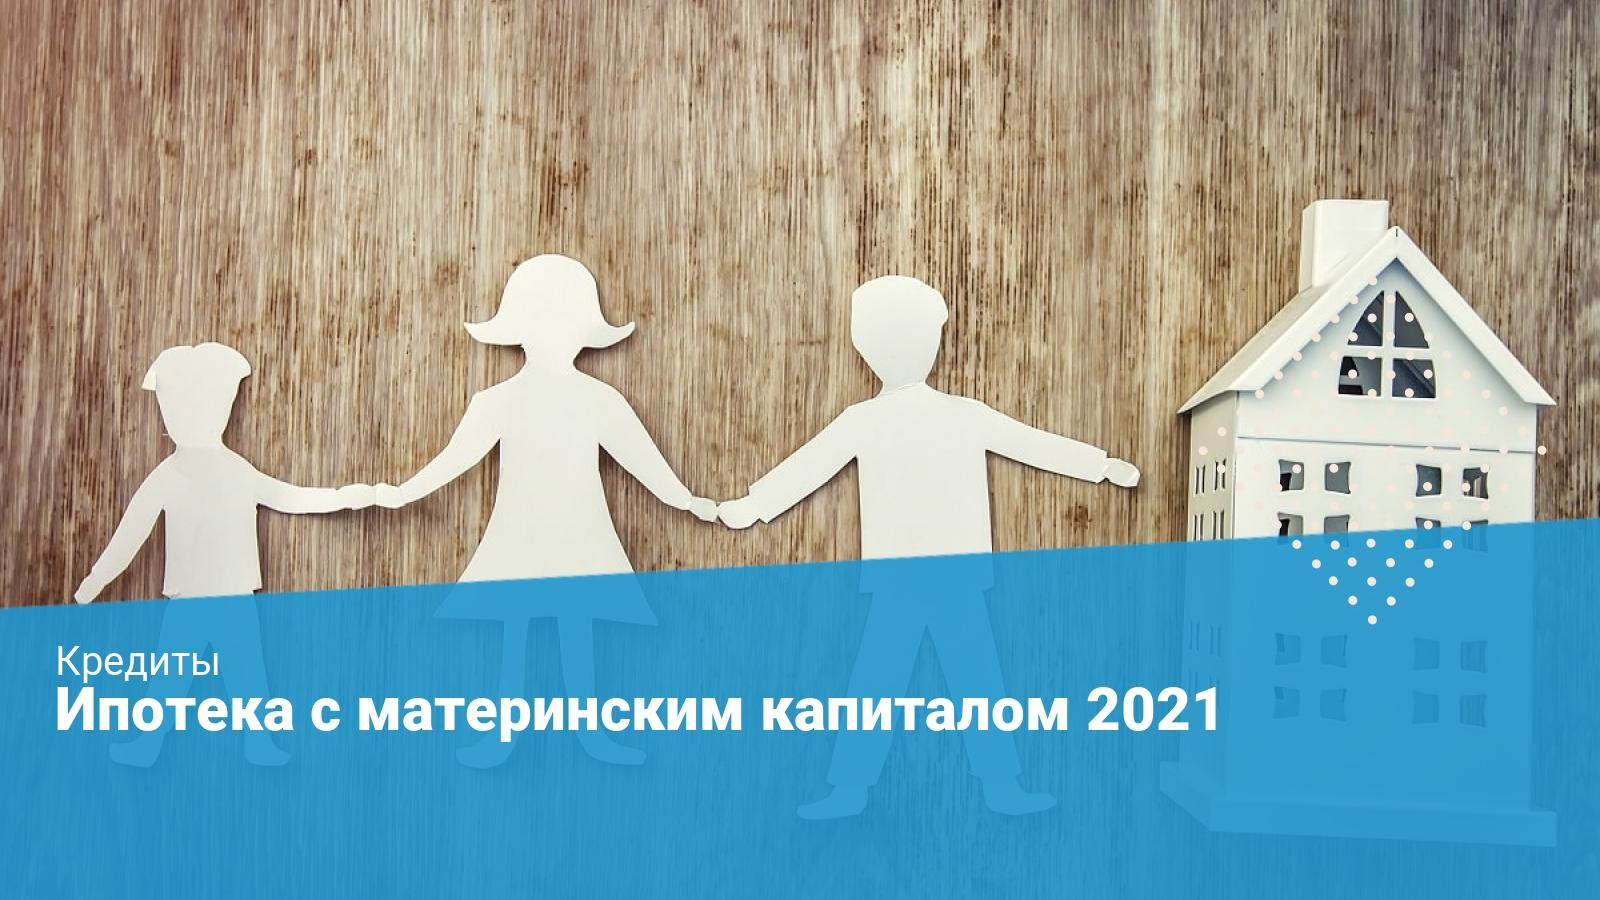 ипотека и материнский капитал 2019